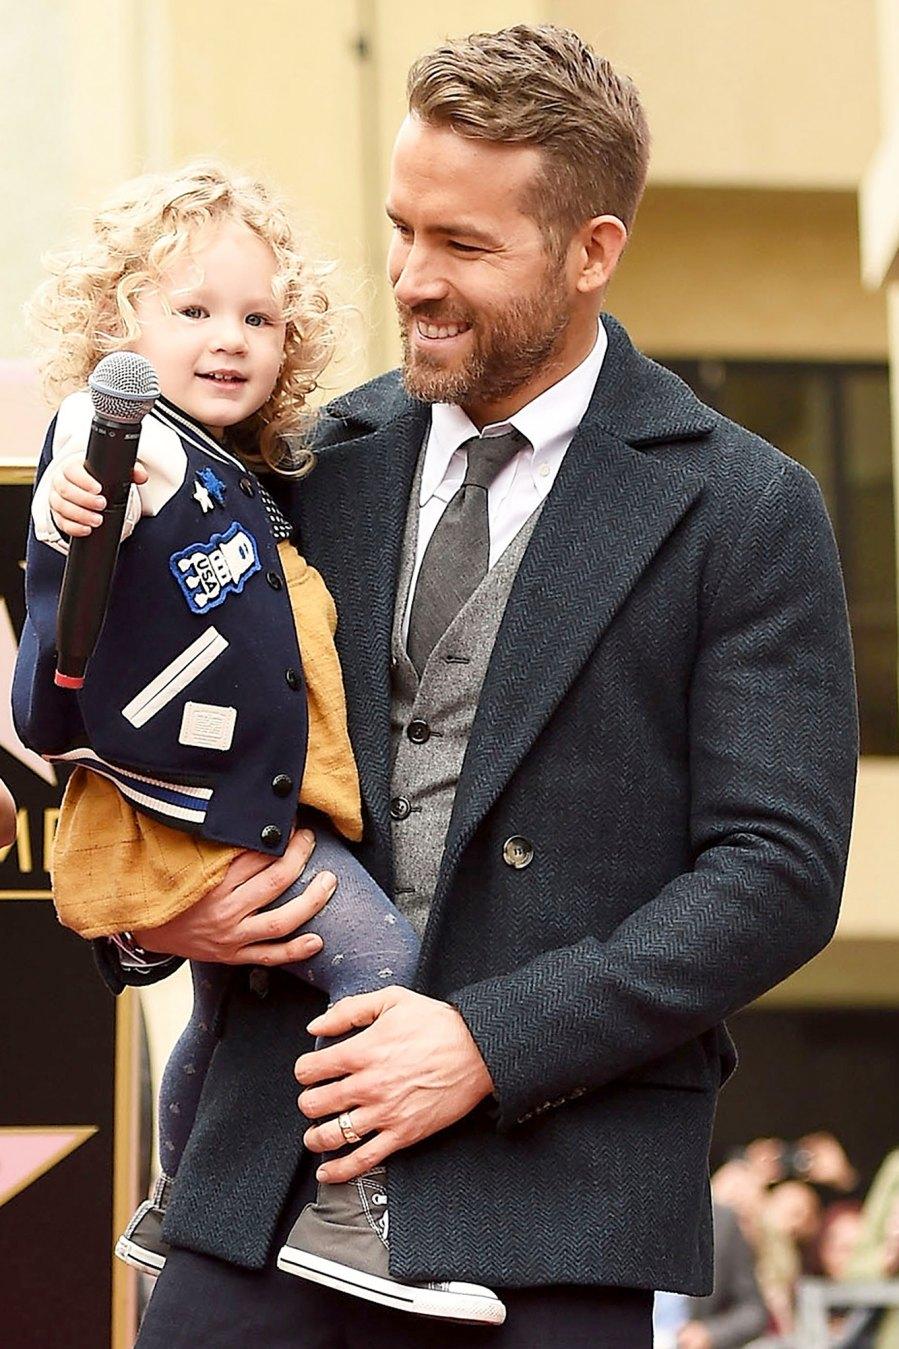 Ryan-Reynolds-Helicopter-Dad